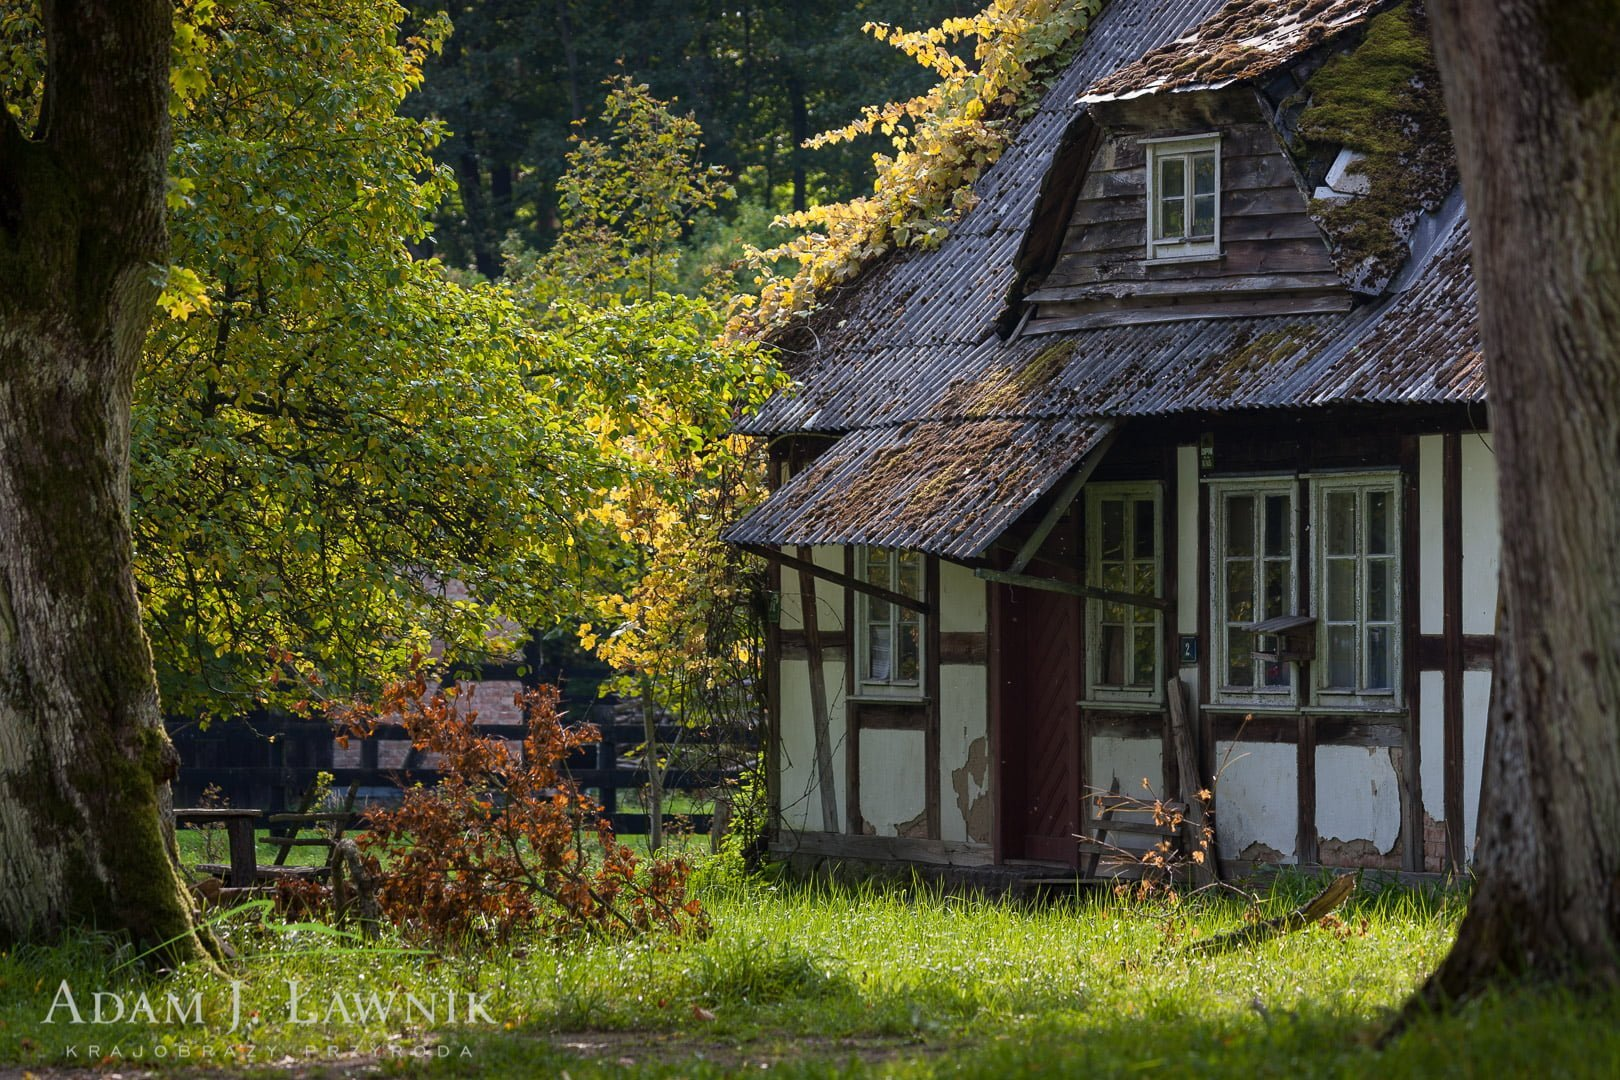 Drawa National Park, Poland 0809-00855C